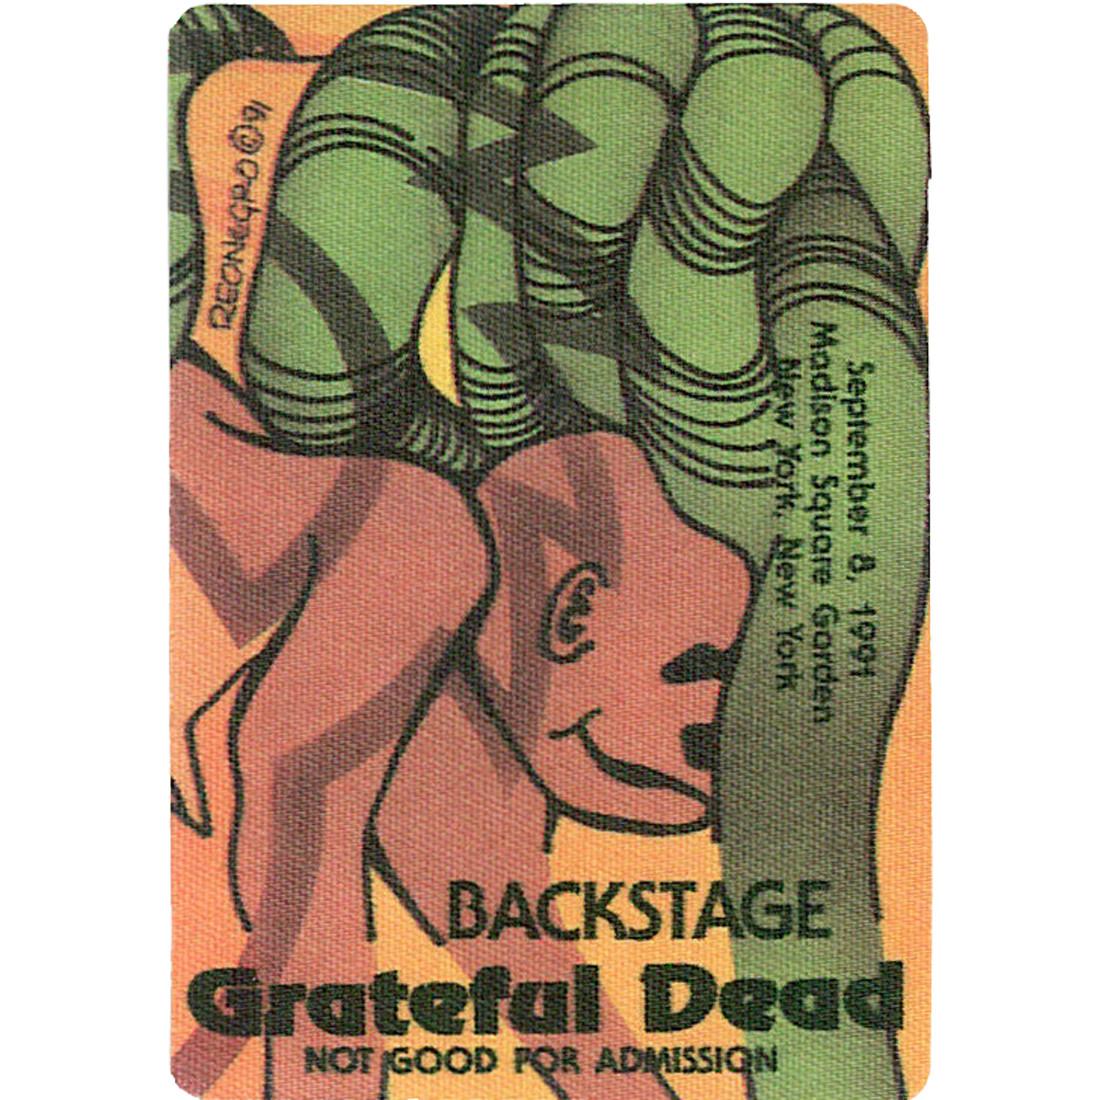 Grateful Dead 1991 09-08 Backstage Pass